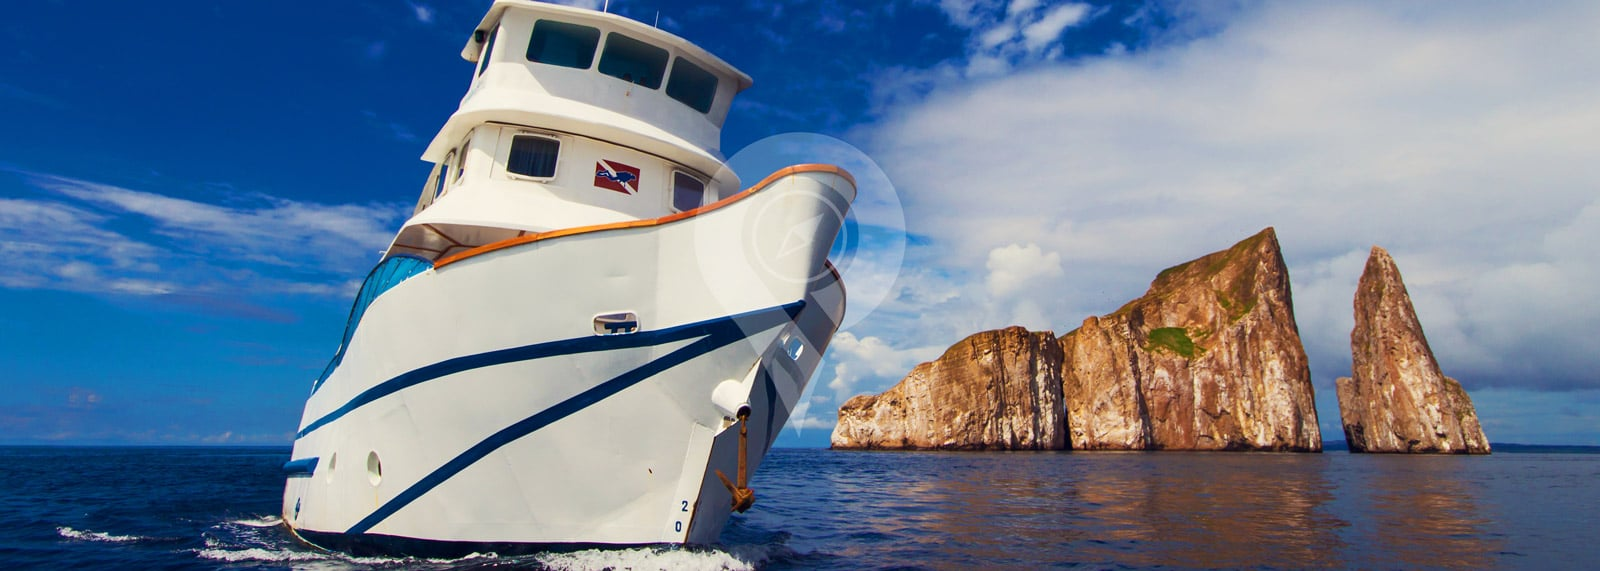 Yate Danubio Azul Galapagos